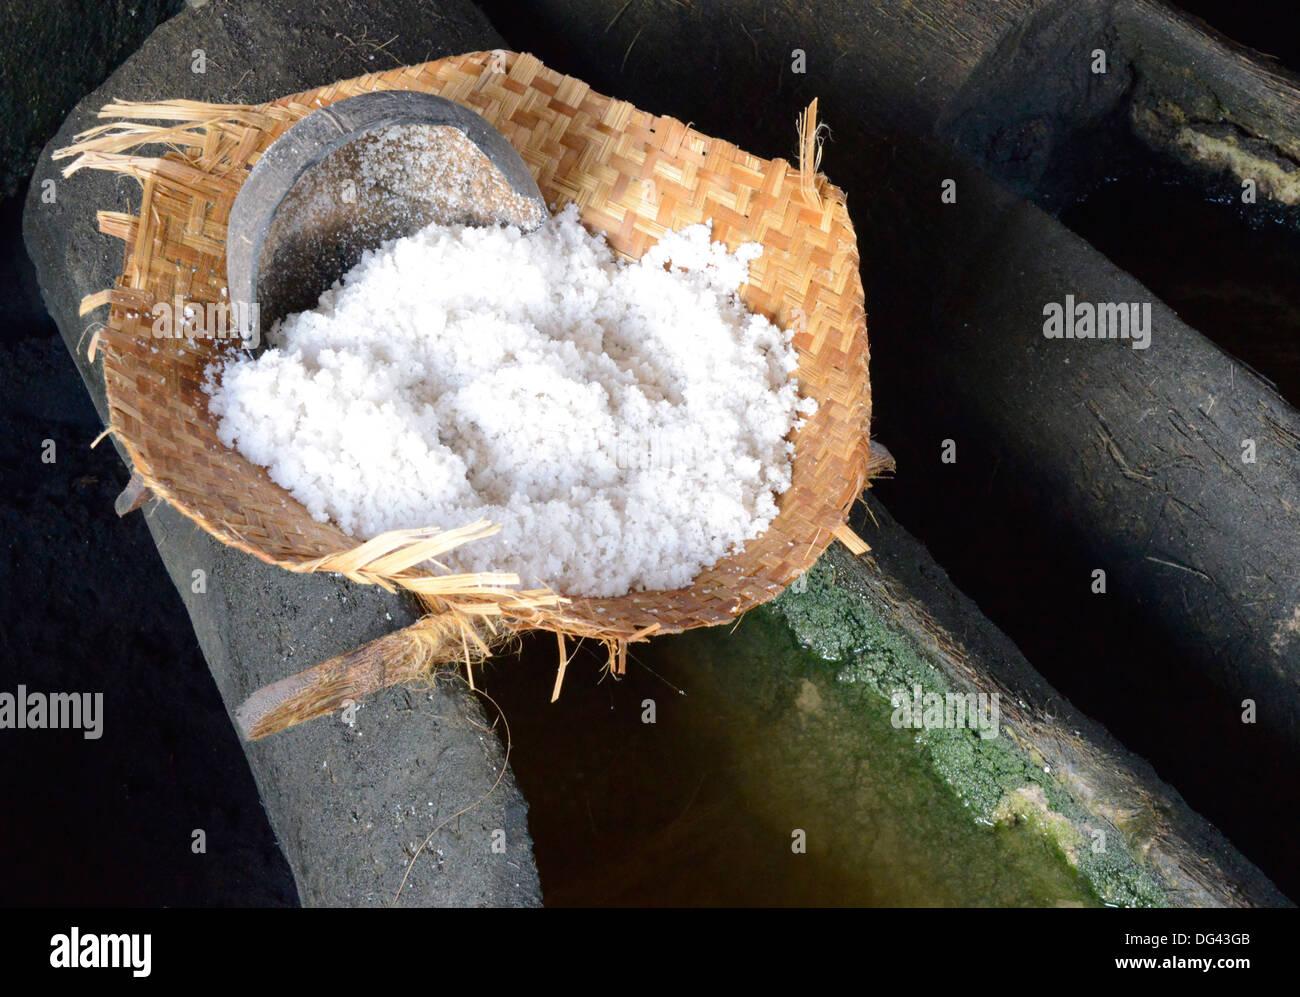 Marine salt production, Kusamba, Bali, Indonesia, Southeast Asia, Asia - Stock Image